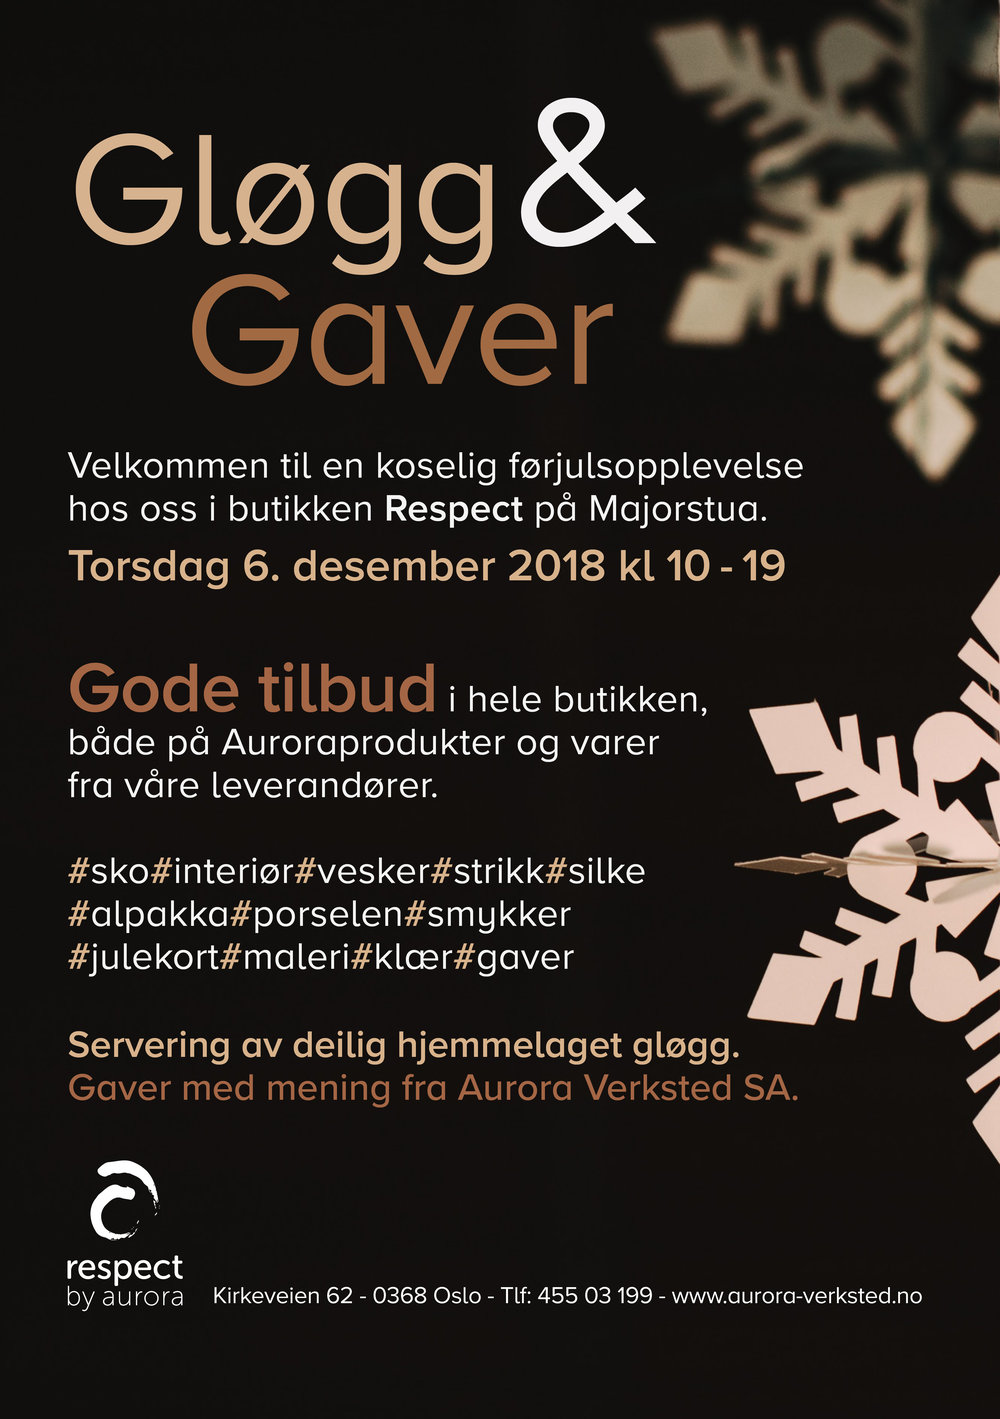 Gløgg & Gaver 2018.jpg